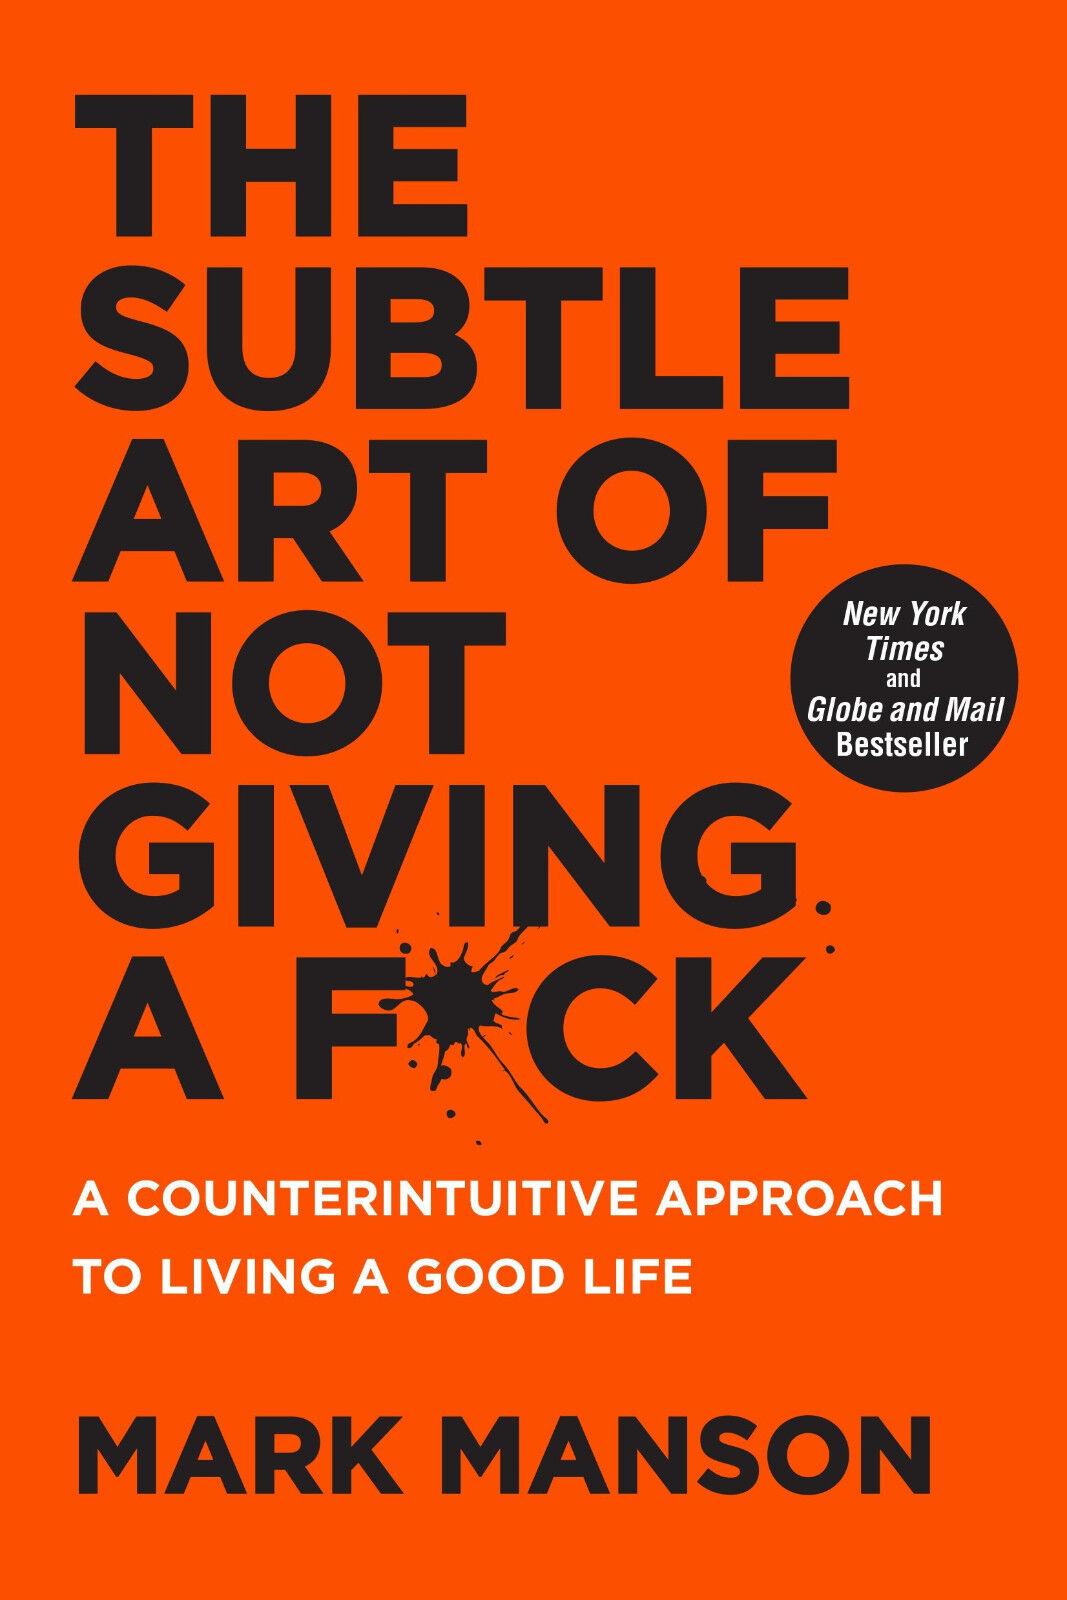 Купить The Subtle Art of Not Giving a Fck by Mark Manson (Paperback)